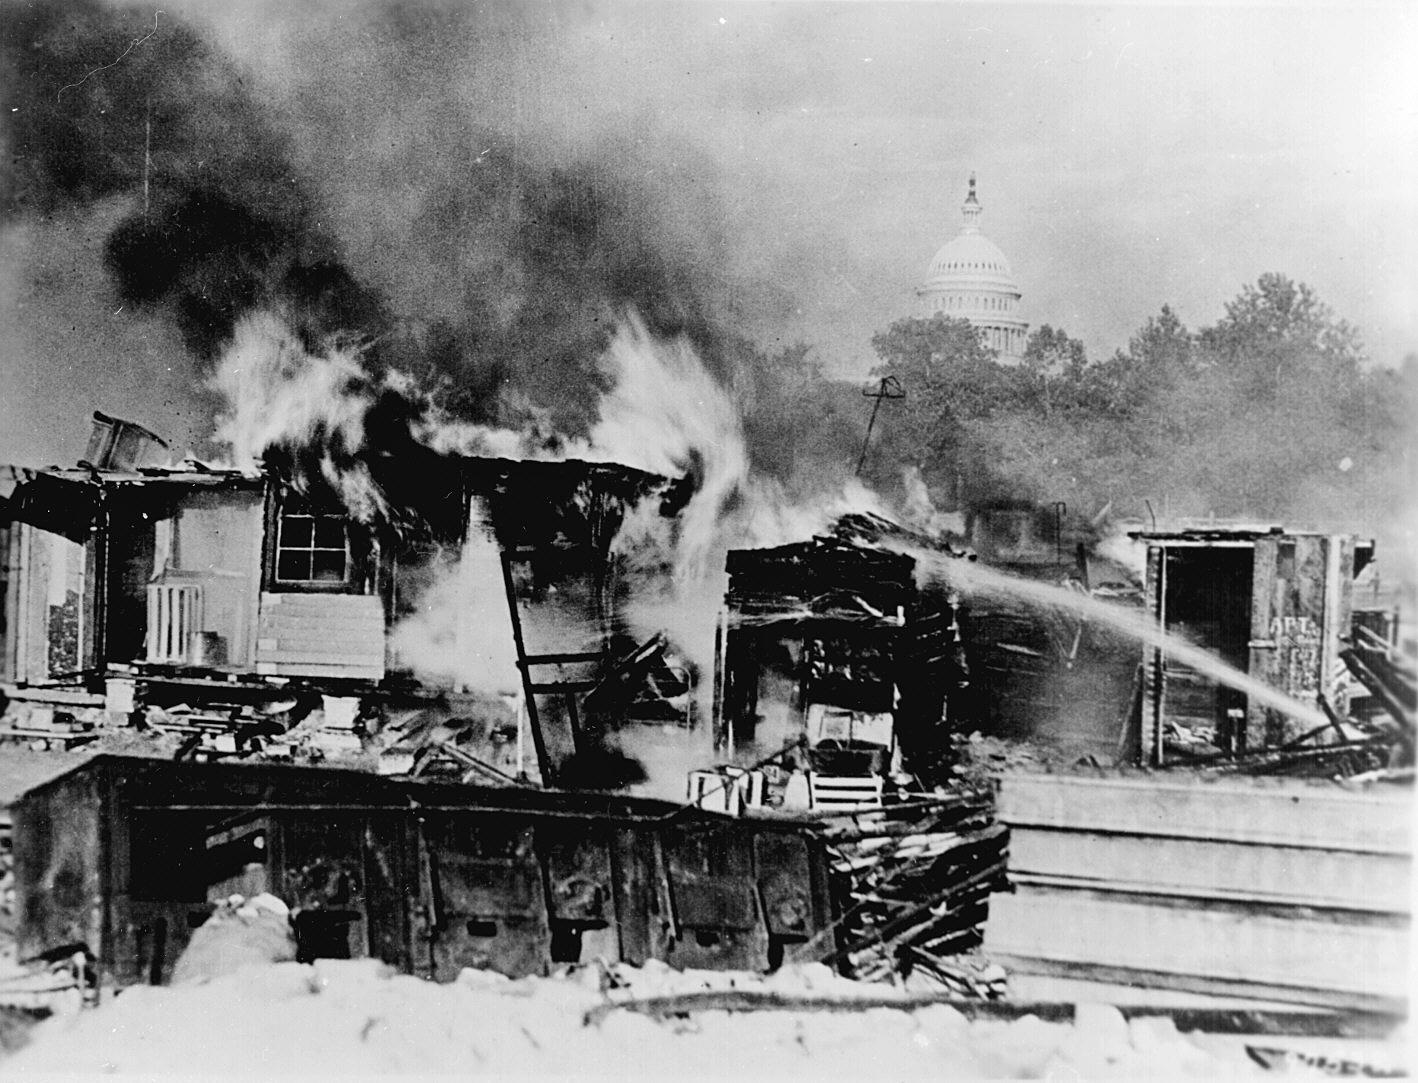 patton-burns-tent-city-in-washington-1932